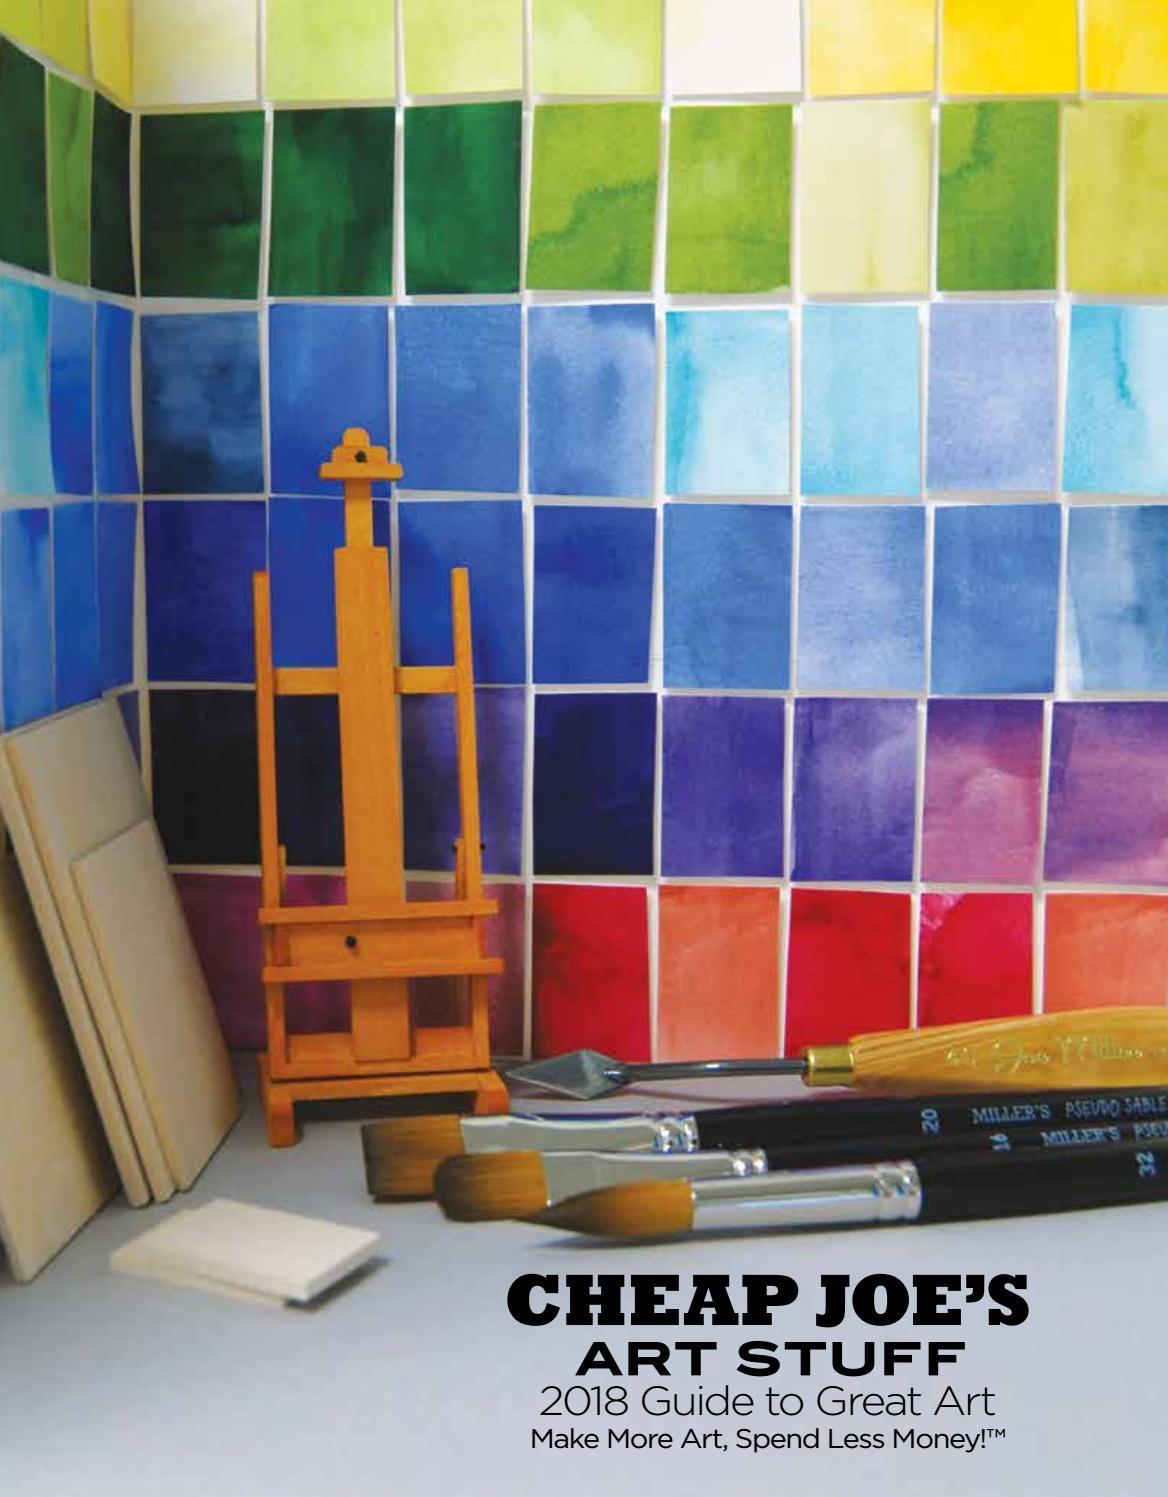 cheap joe's art stuff 2018 guide to great artcheap joe's art